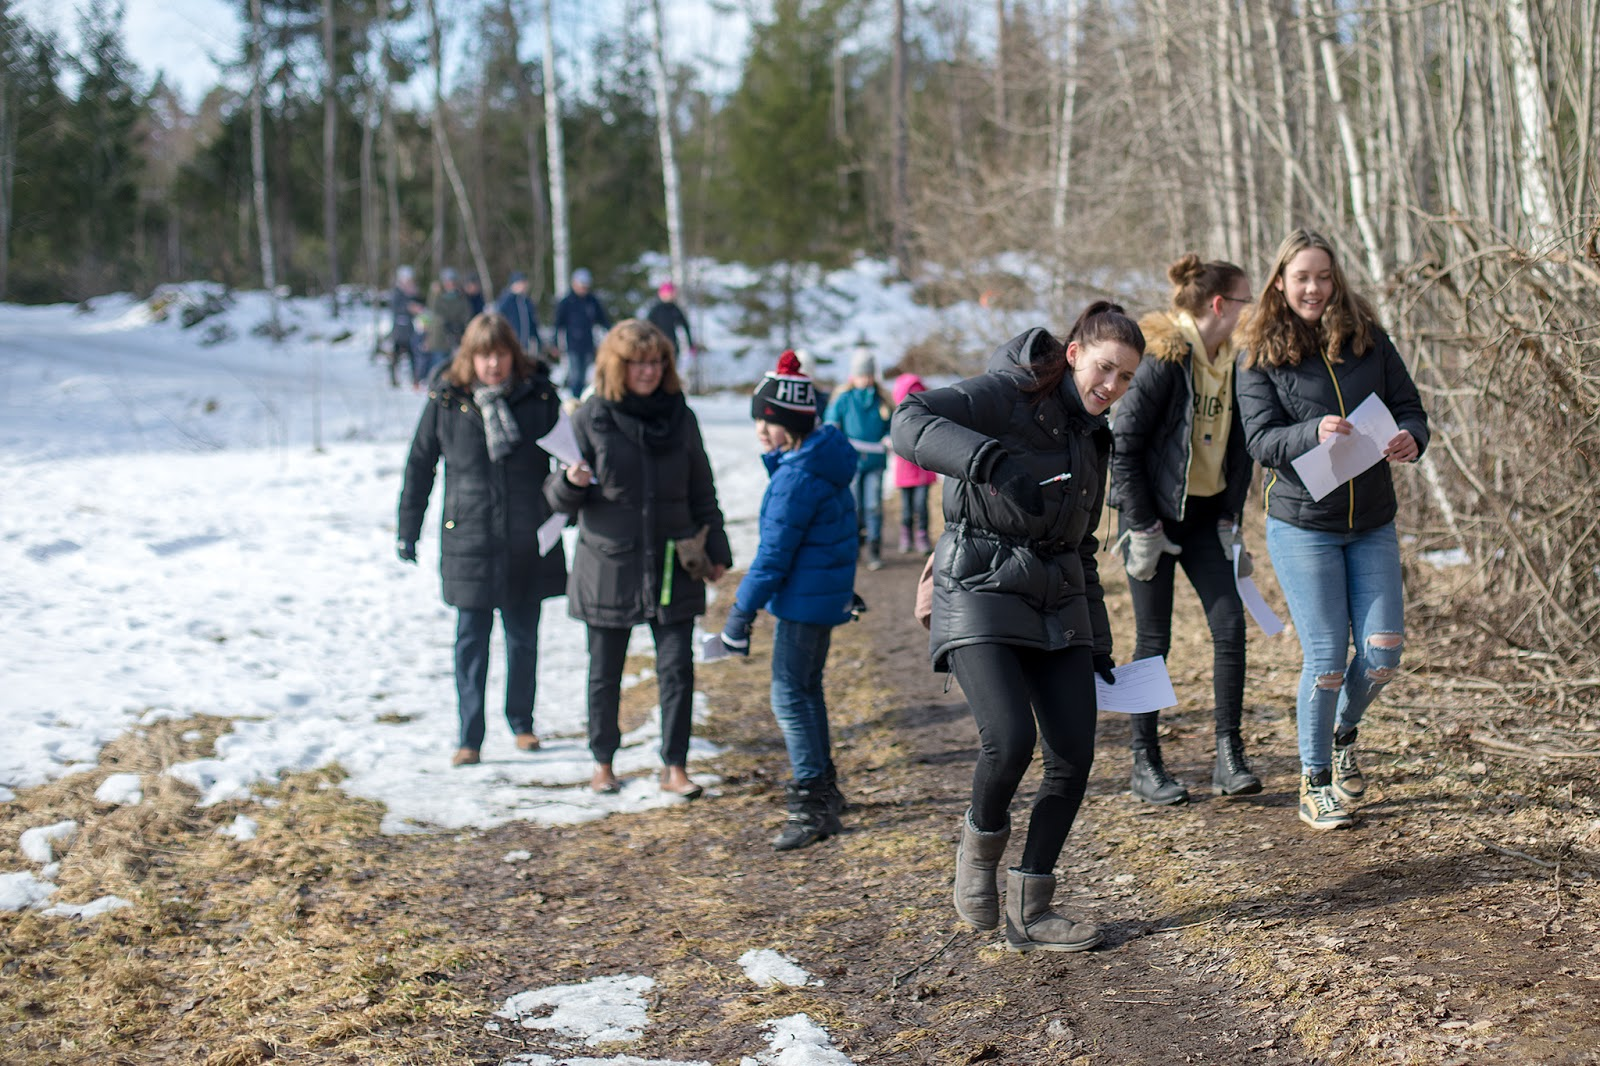 Anna Johansson, Stigtomta Stavstugan Enelund 1, Vrena